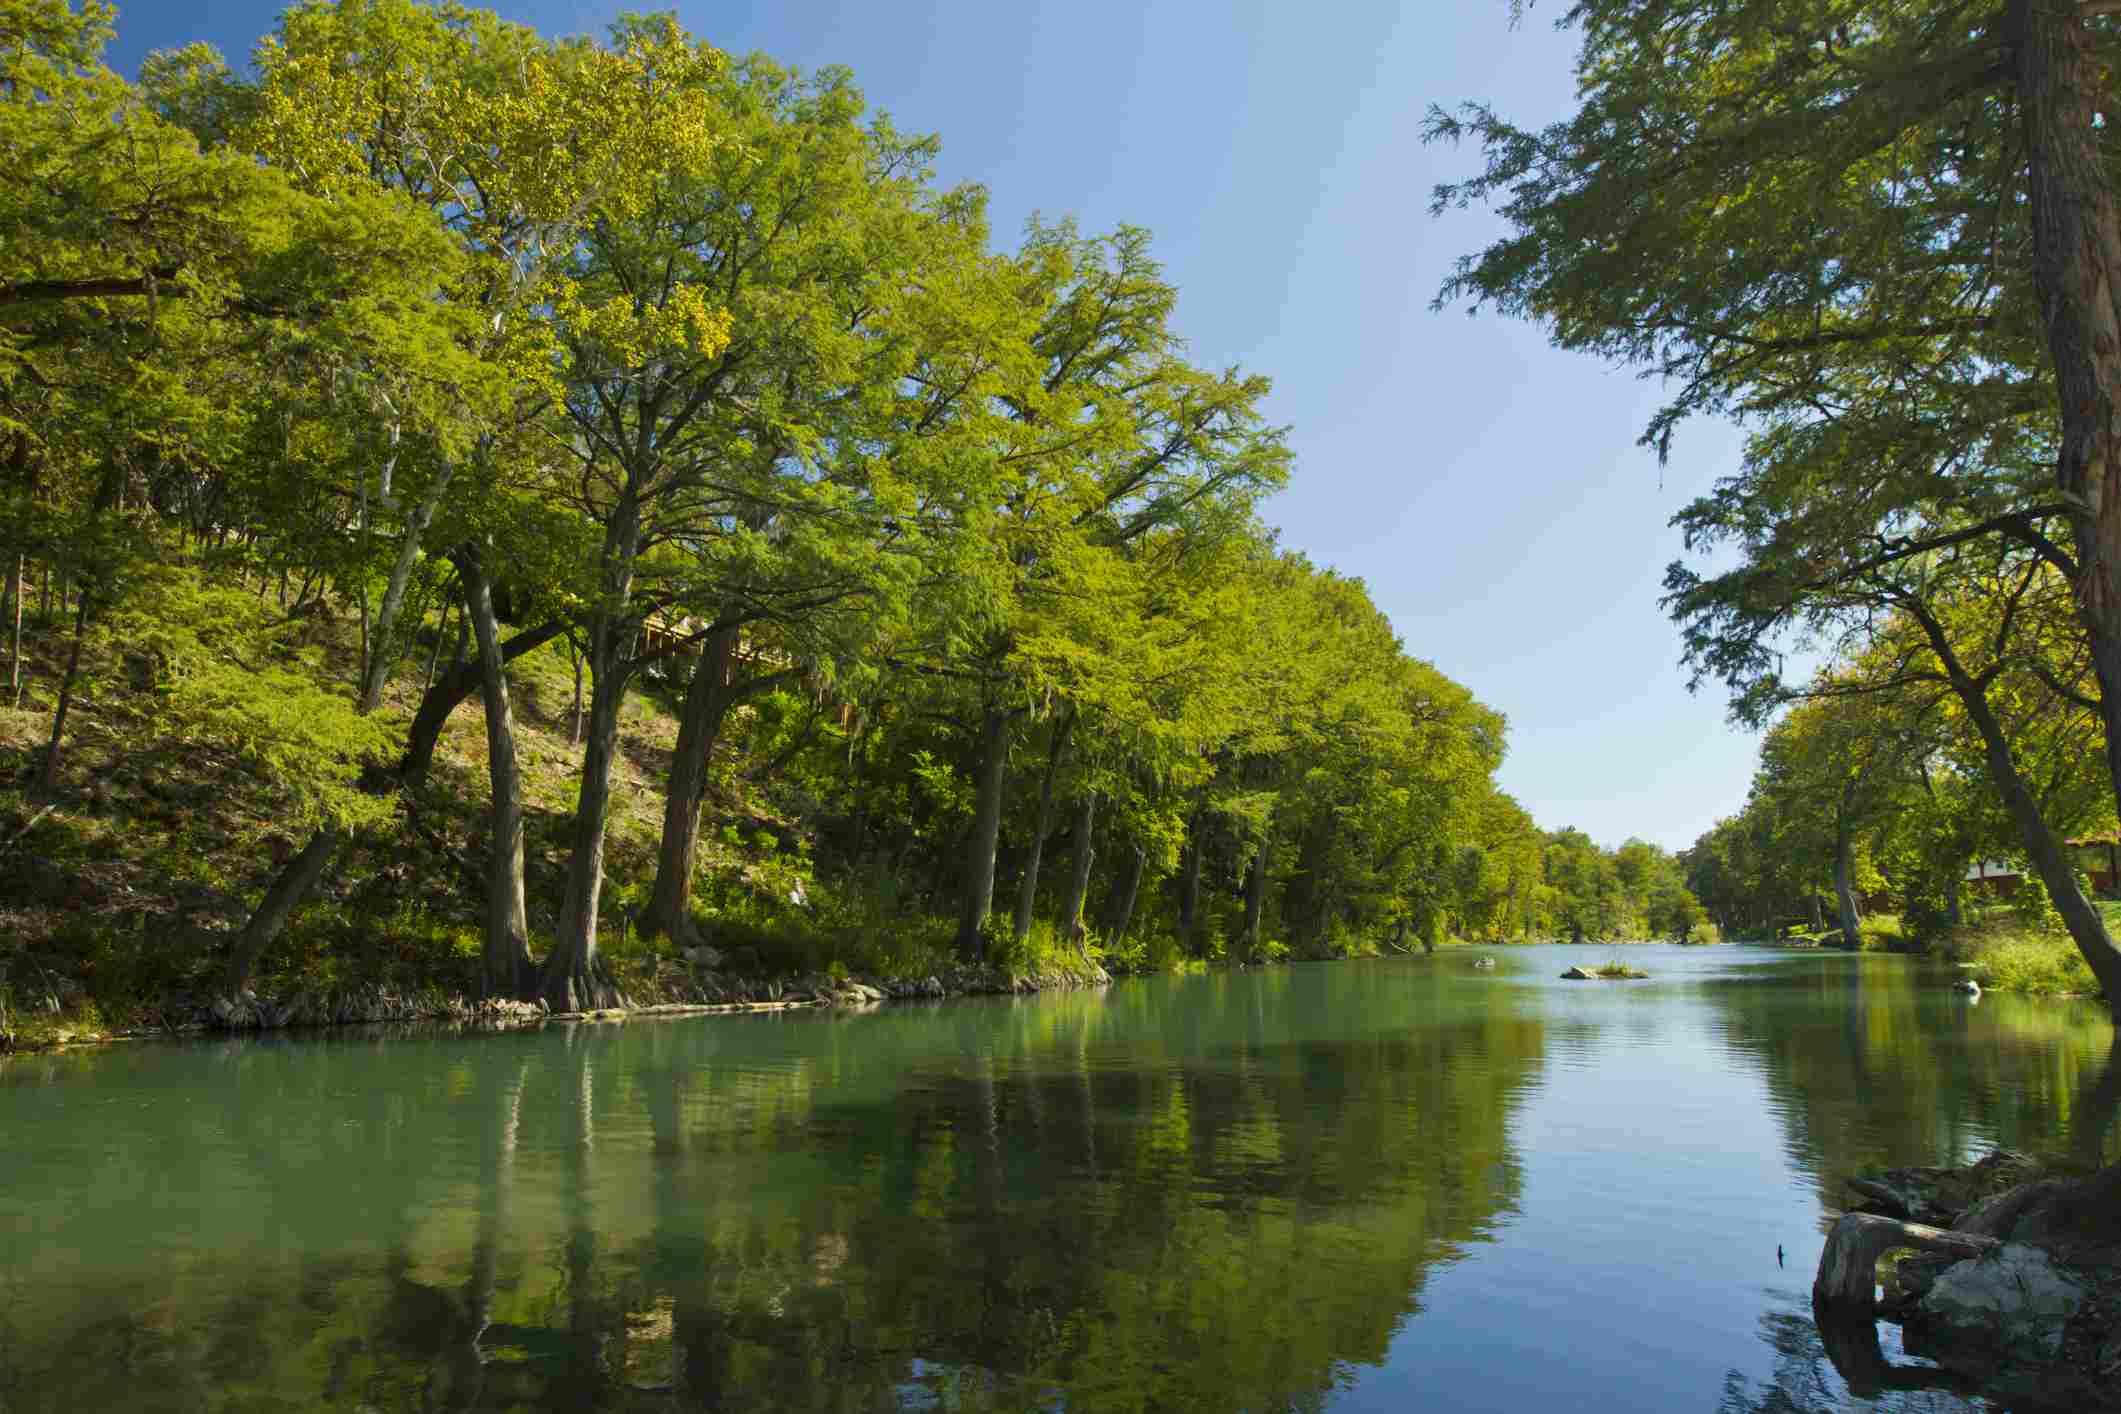 Bald cypress trees at Gruene, near New Braunfels, Guadalupe River, Texas, USA